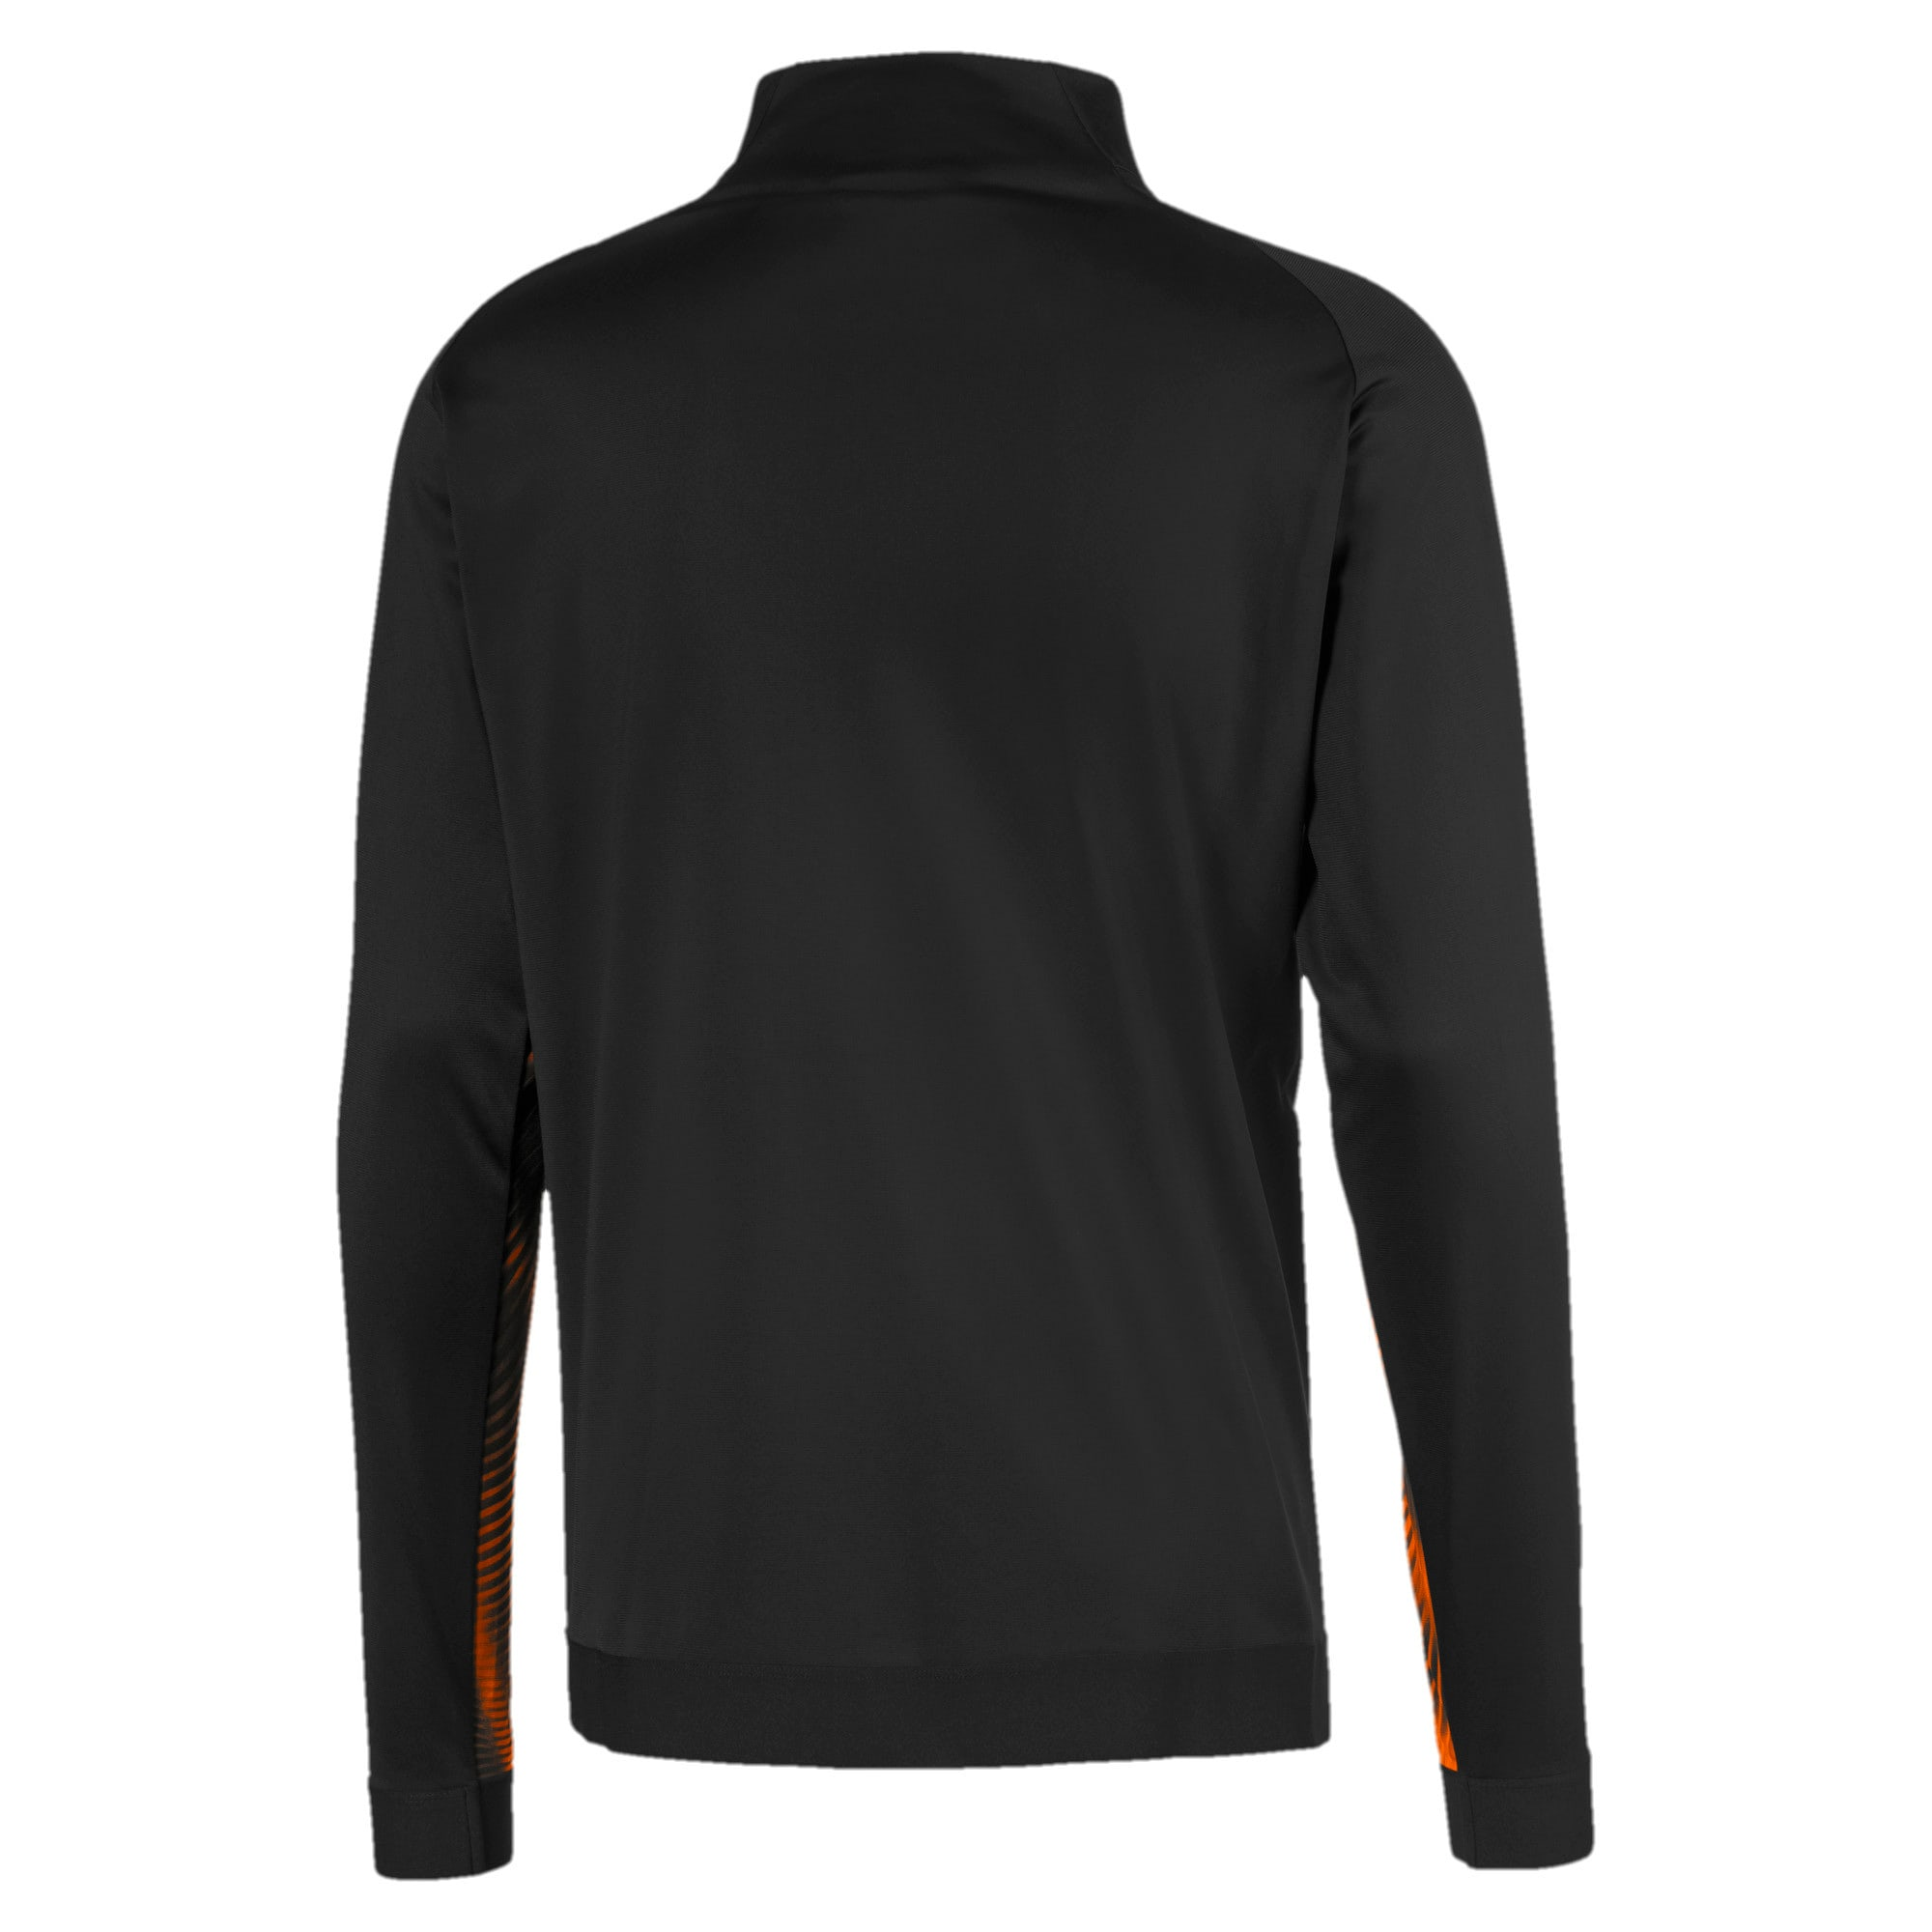 Thumbnail 2 van Valencia CF stadionjack voor mannen, Puma zwart-vibrant orange, medium